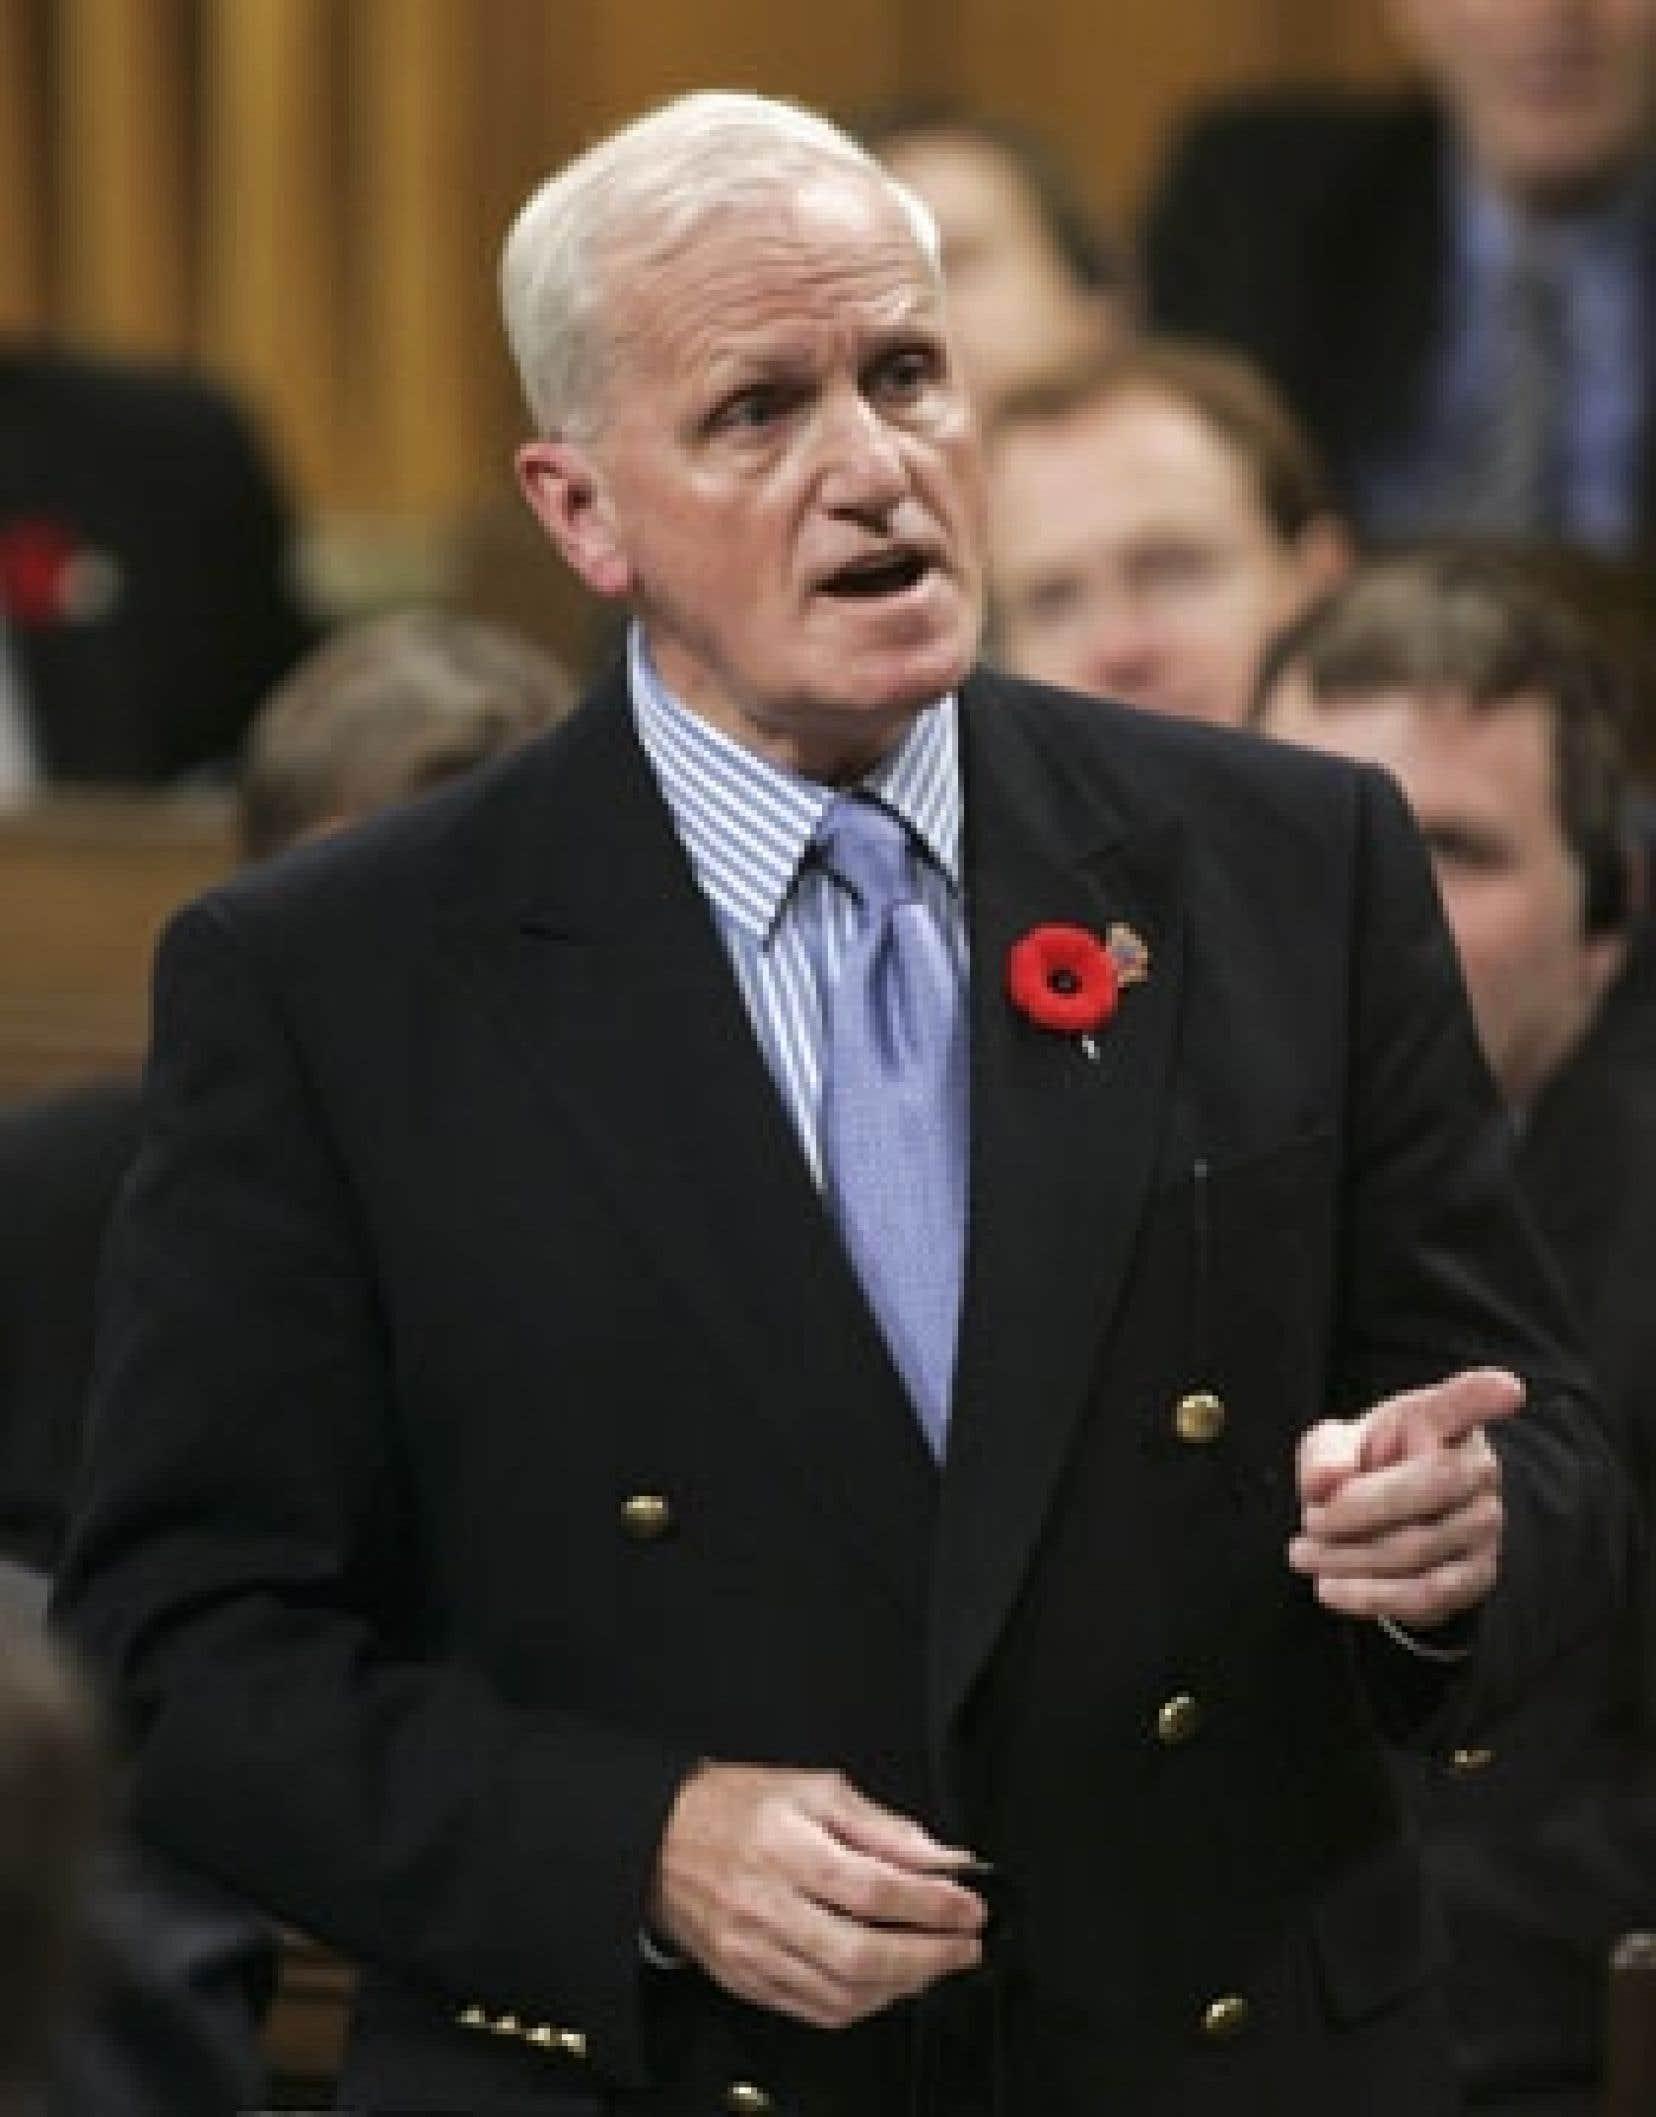 Gordon O'Connor, ministre canadien de la Défense